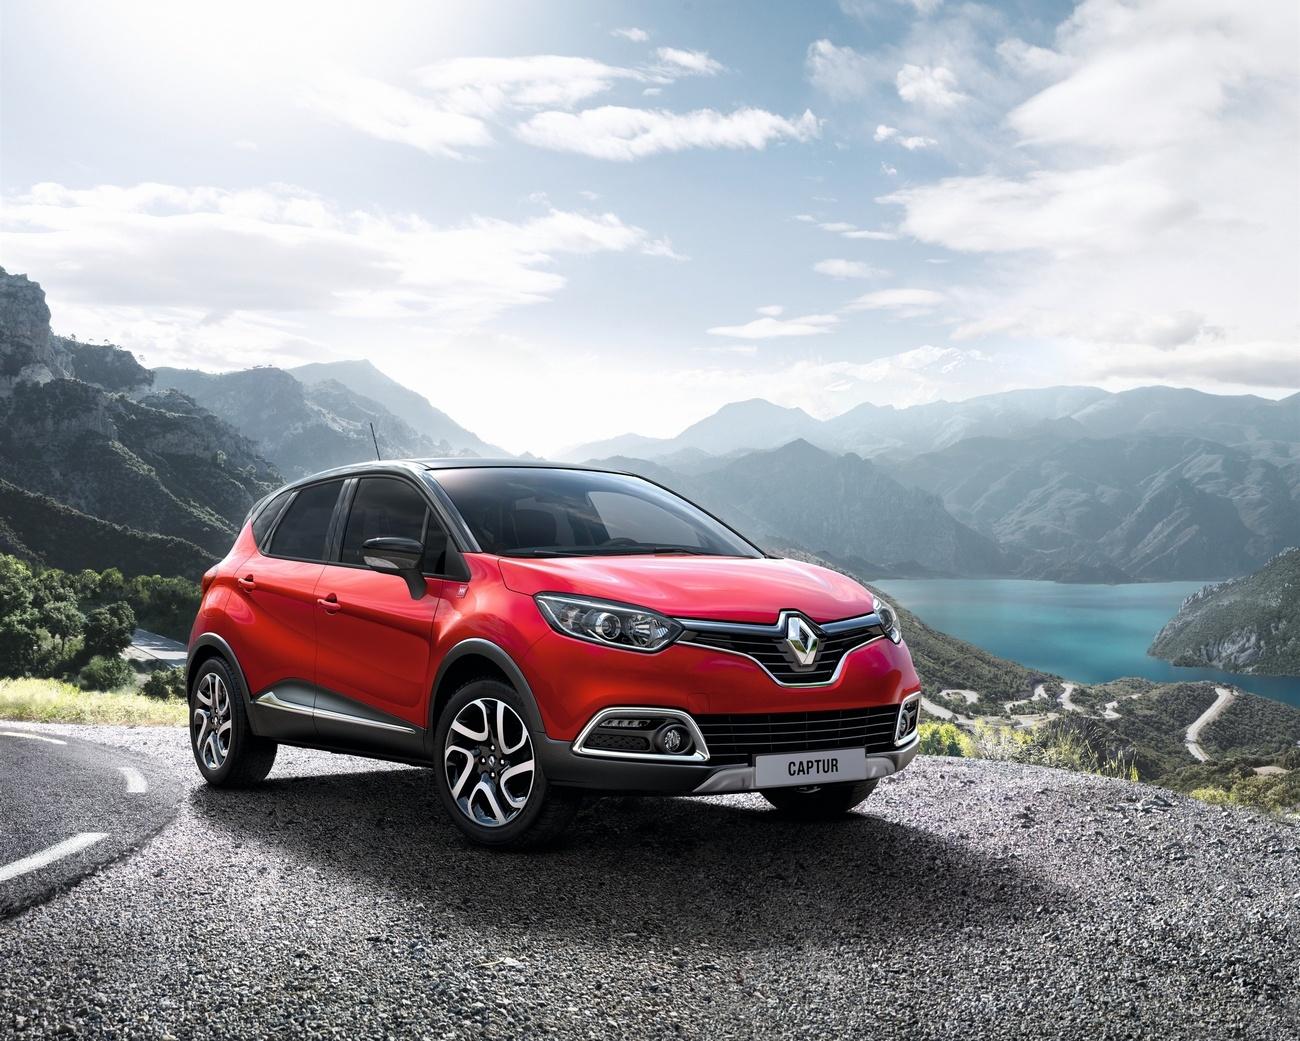 Renault Captur Helly Hansen Limited Edition